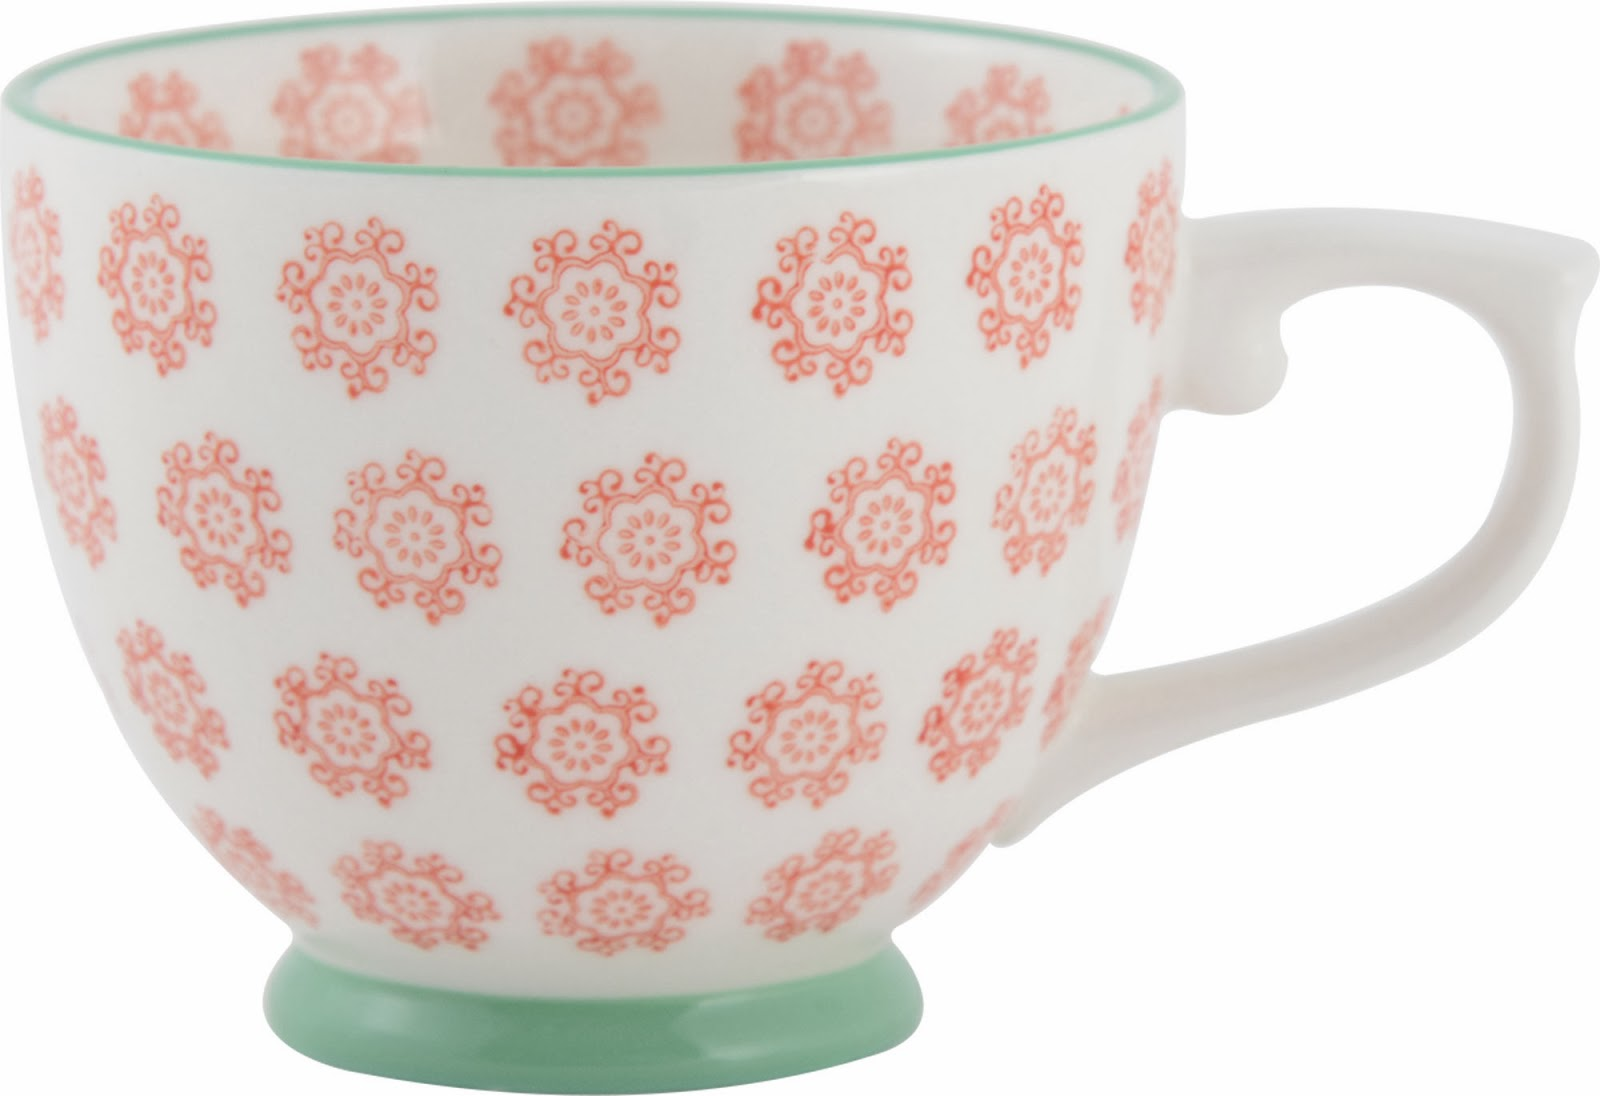 The Wanderer ethnic tea cup